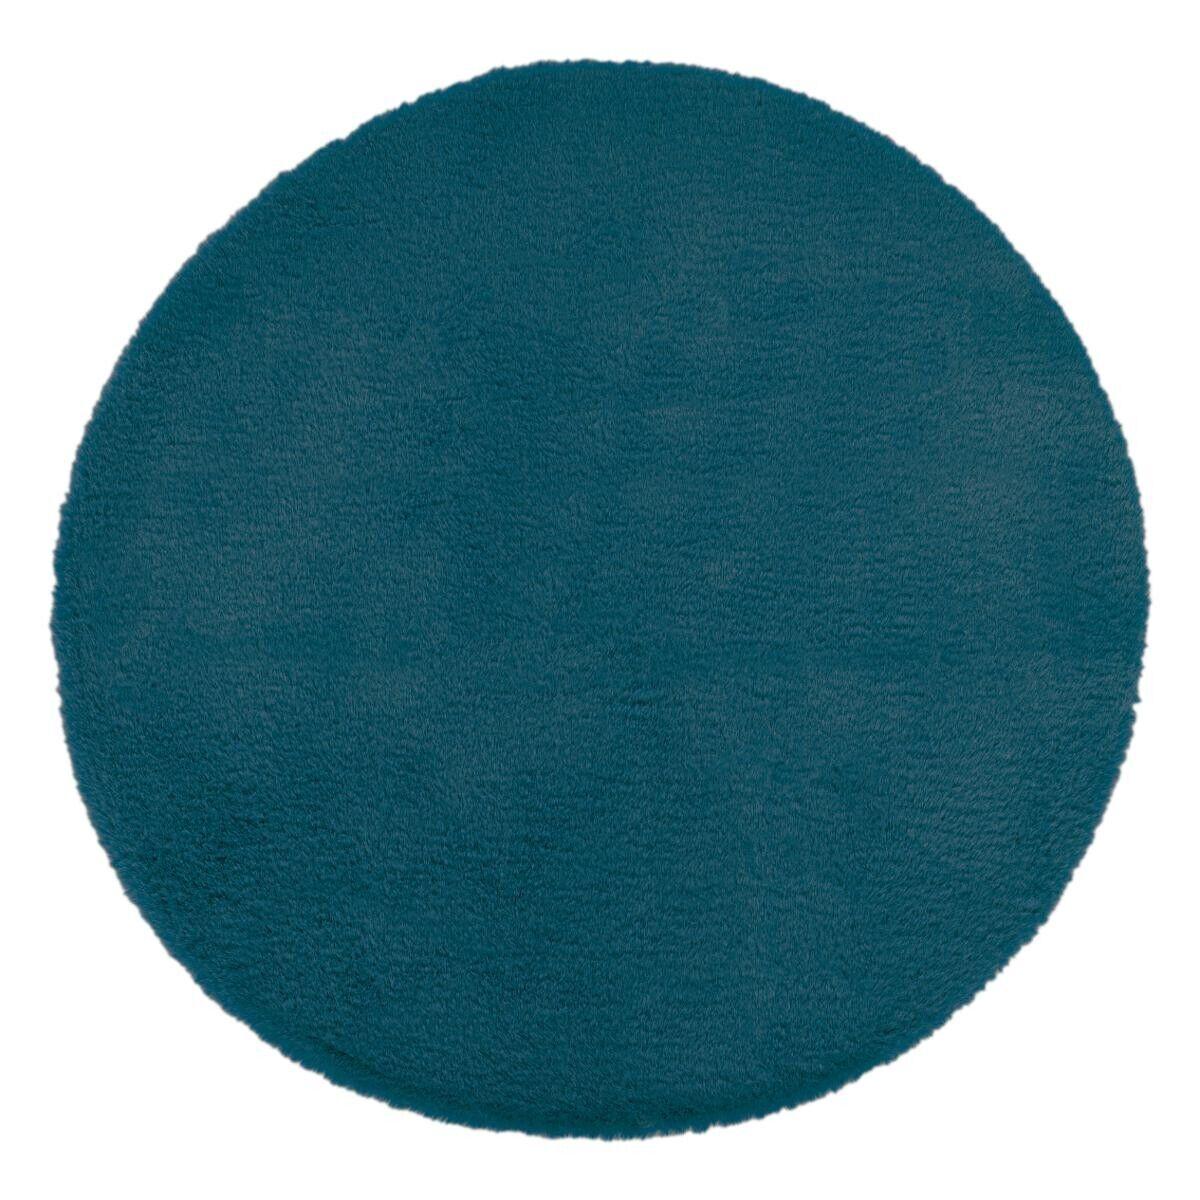 Atmosphera Tapis extra doux, effet fourrure, bleu canard D80 cm